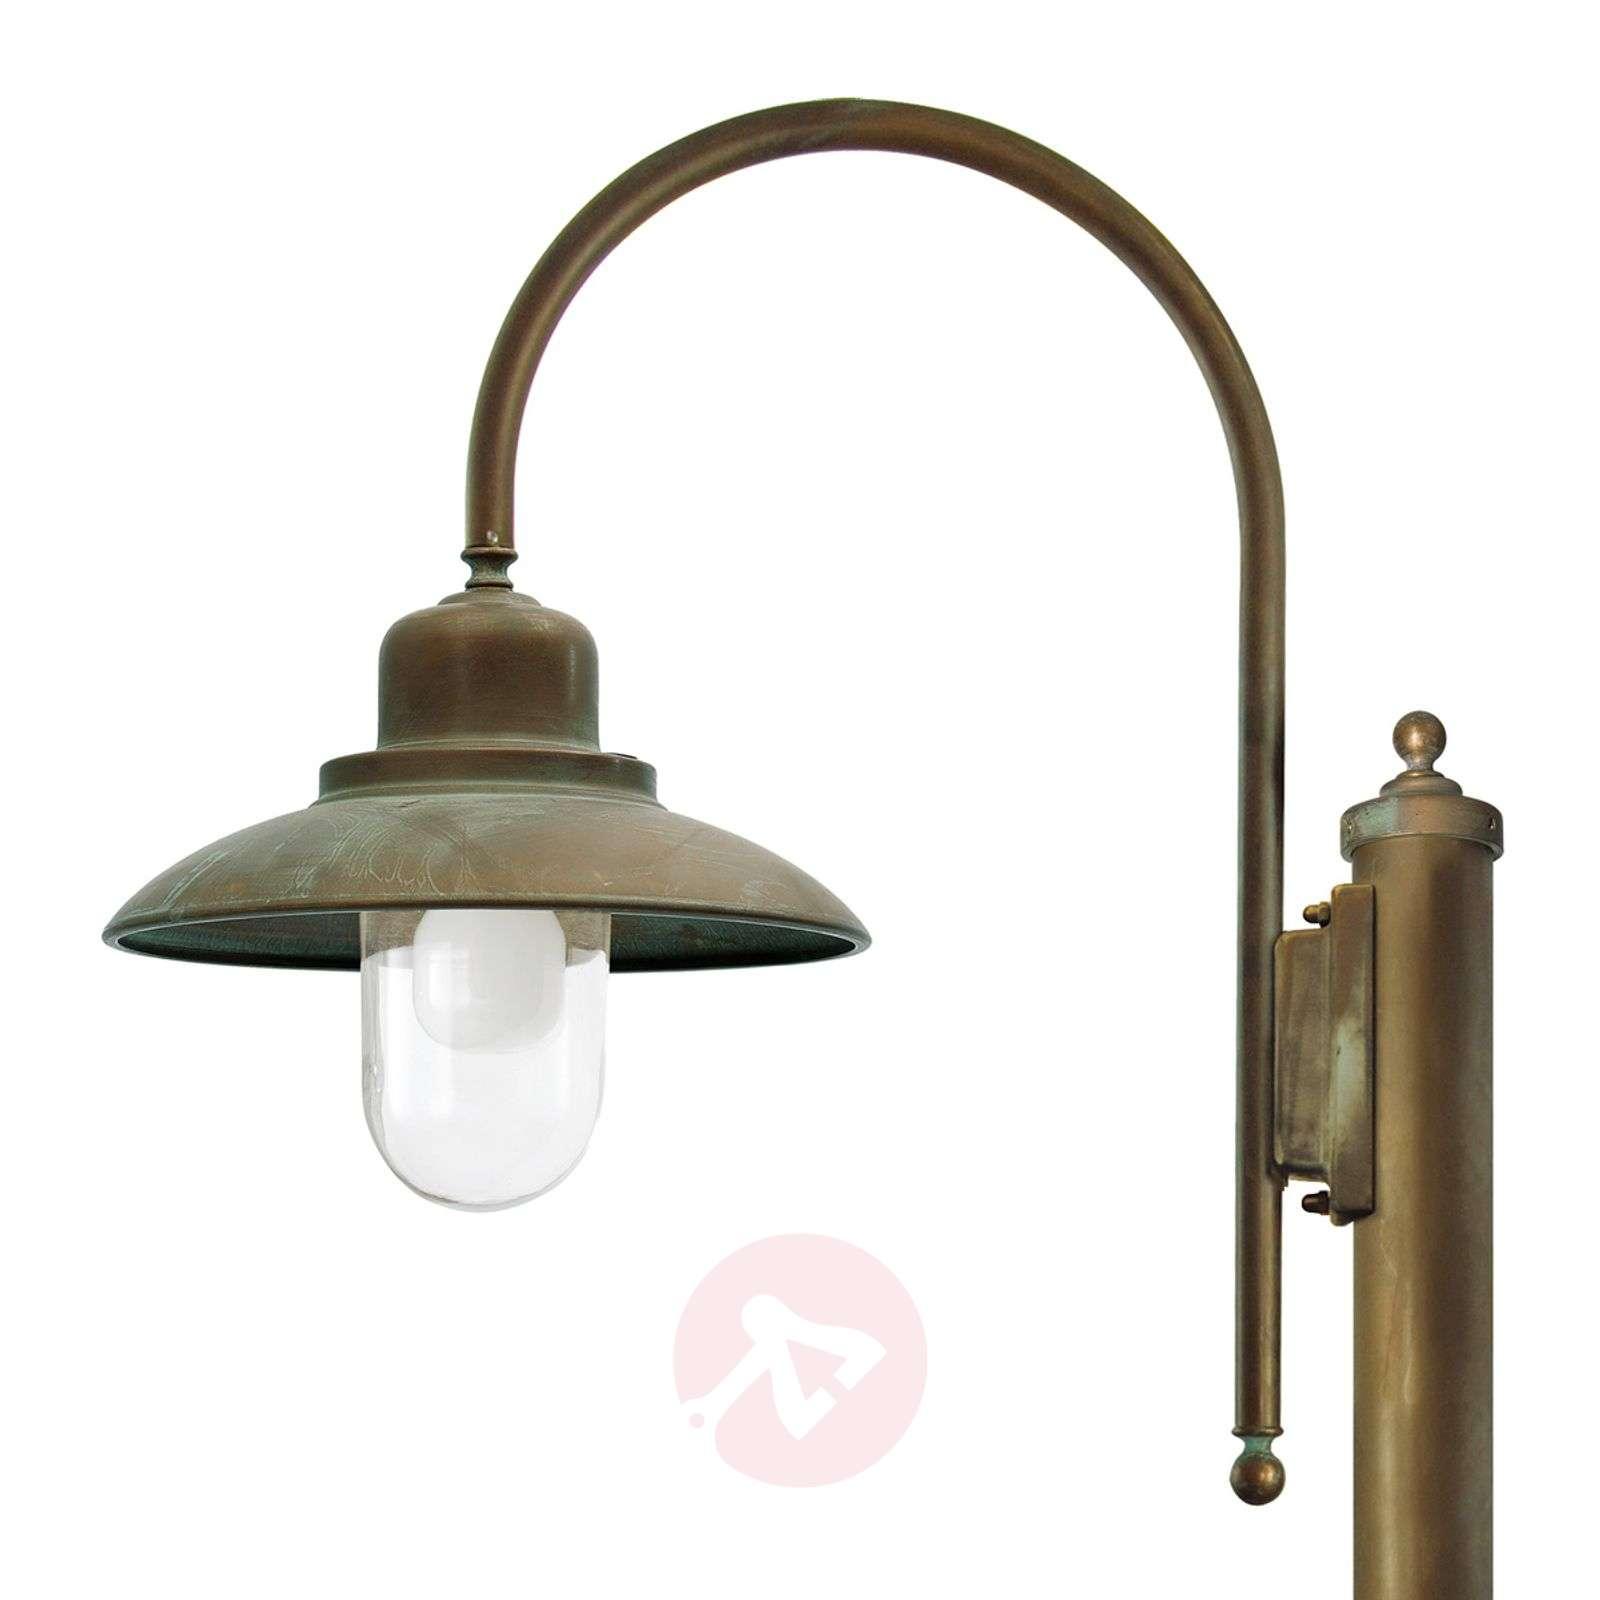 270 cm tall post light Casale-6515291-01